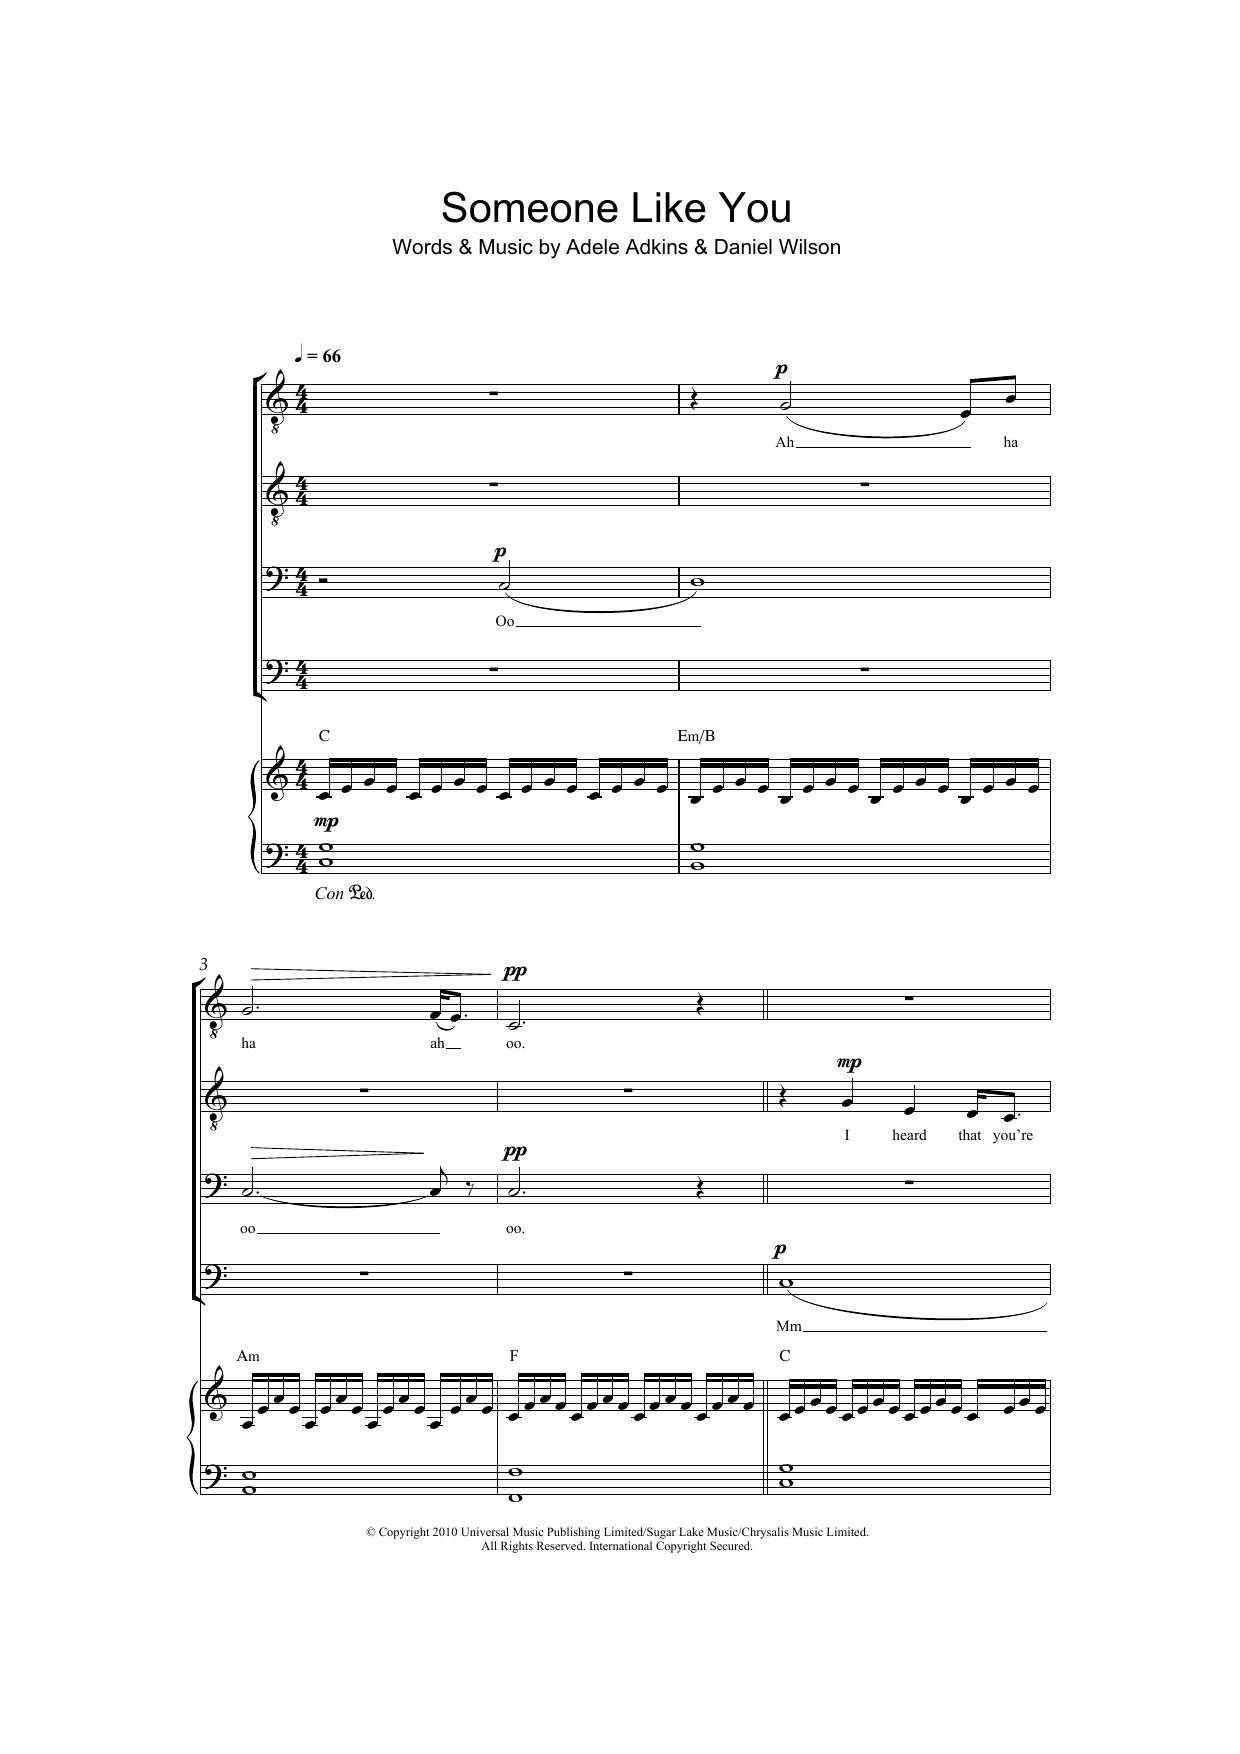 Sheet Music Digital Files To Print Licensed Daniel Wilson Digital